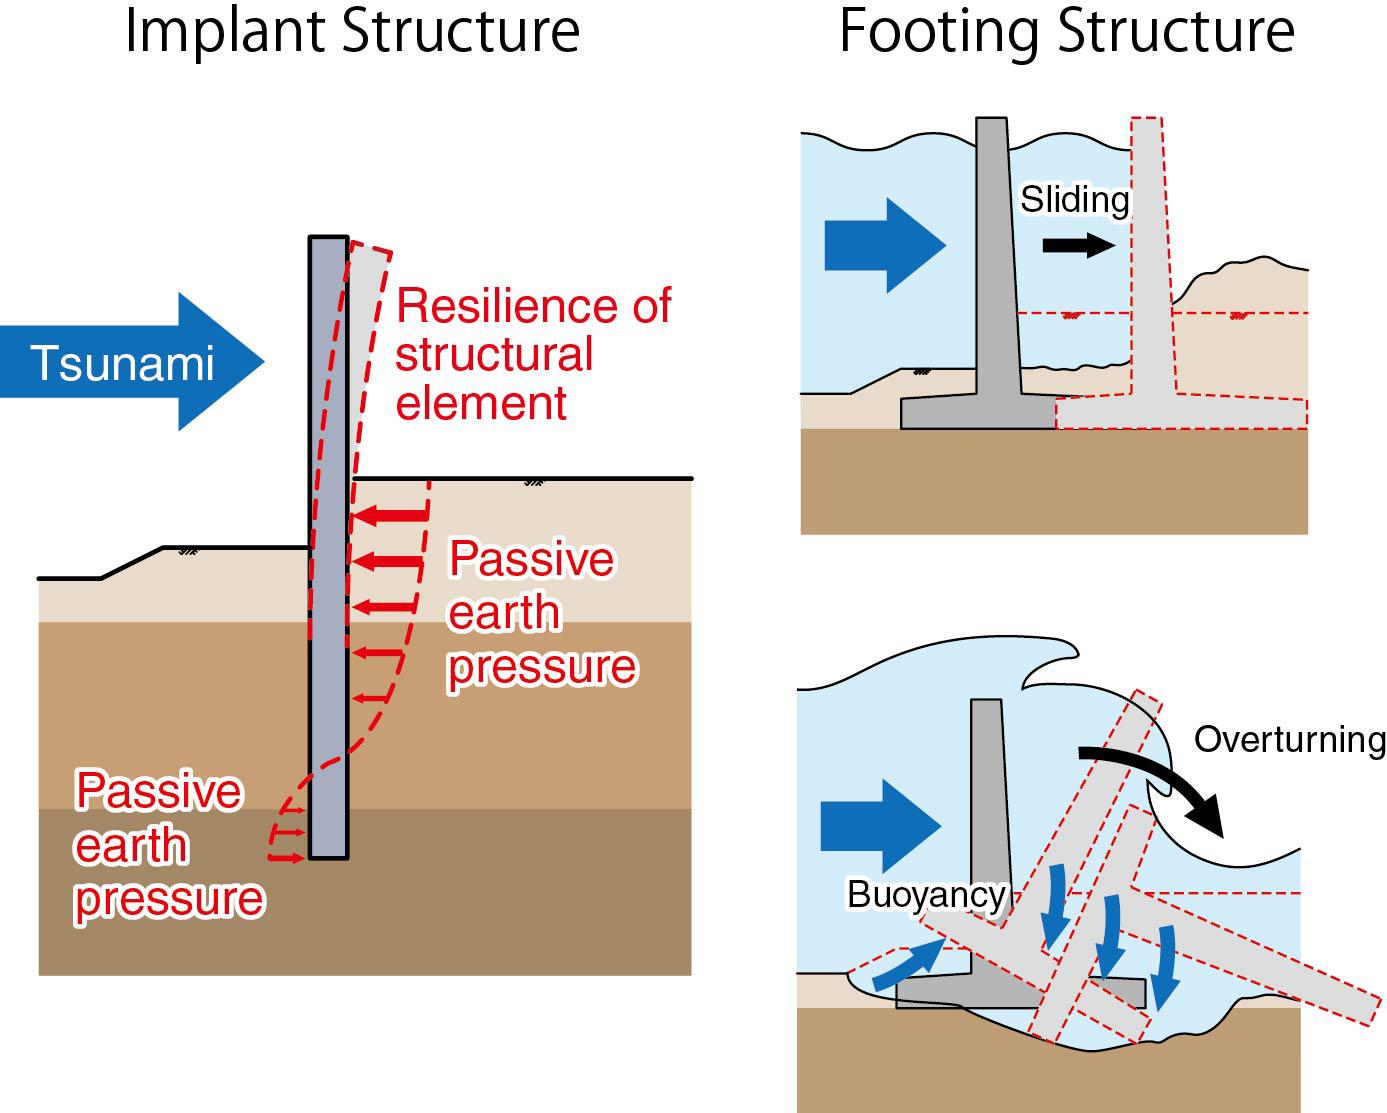 inplant_footing-2